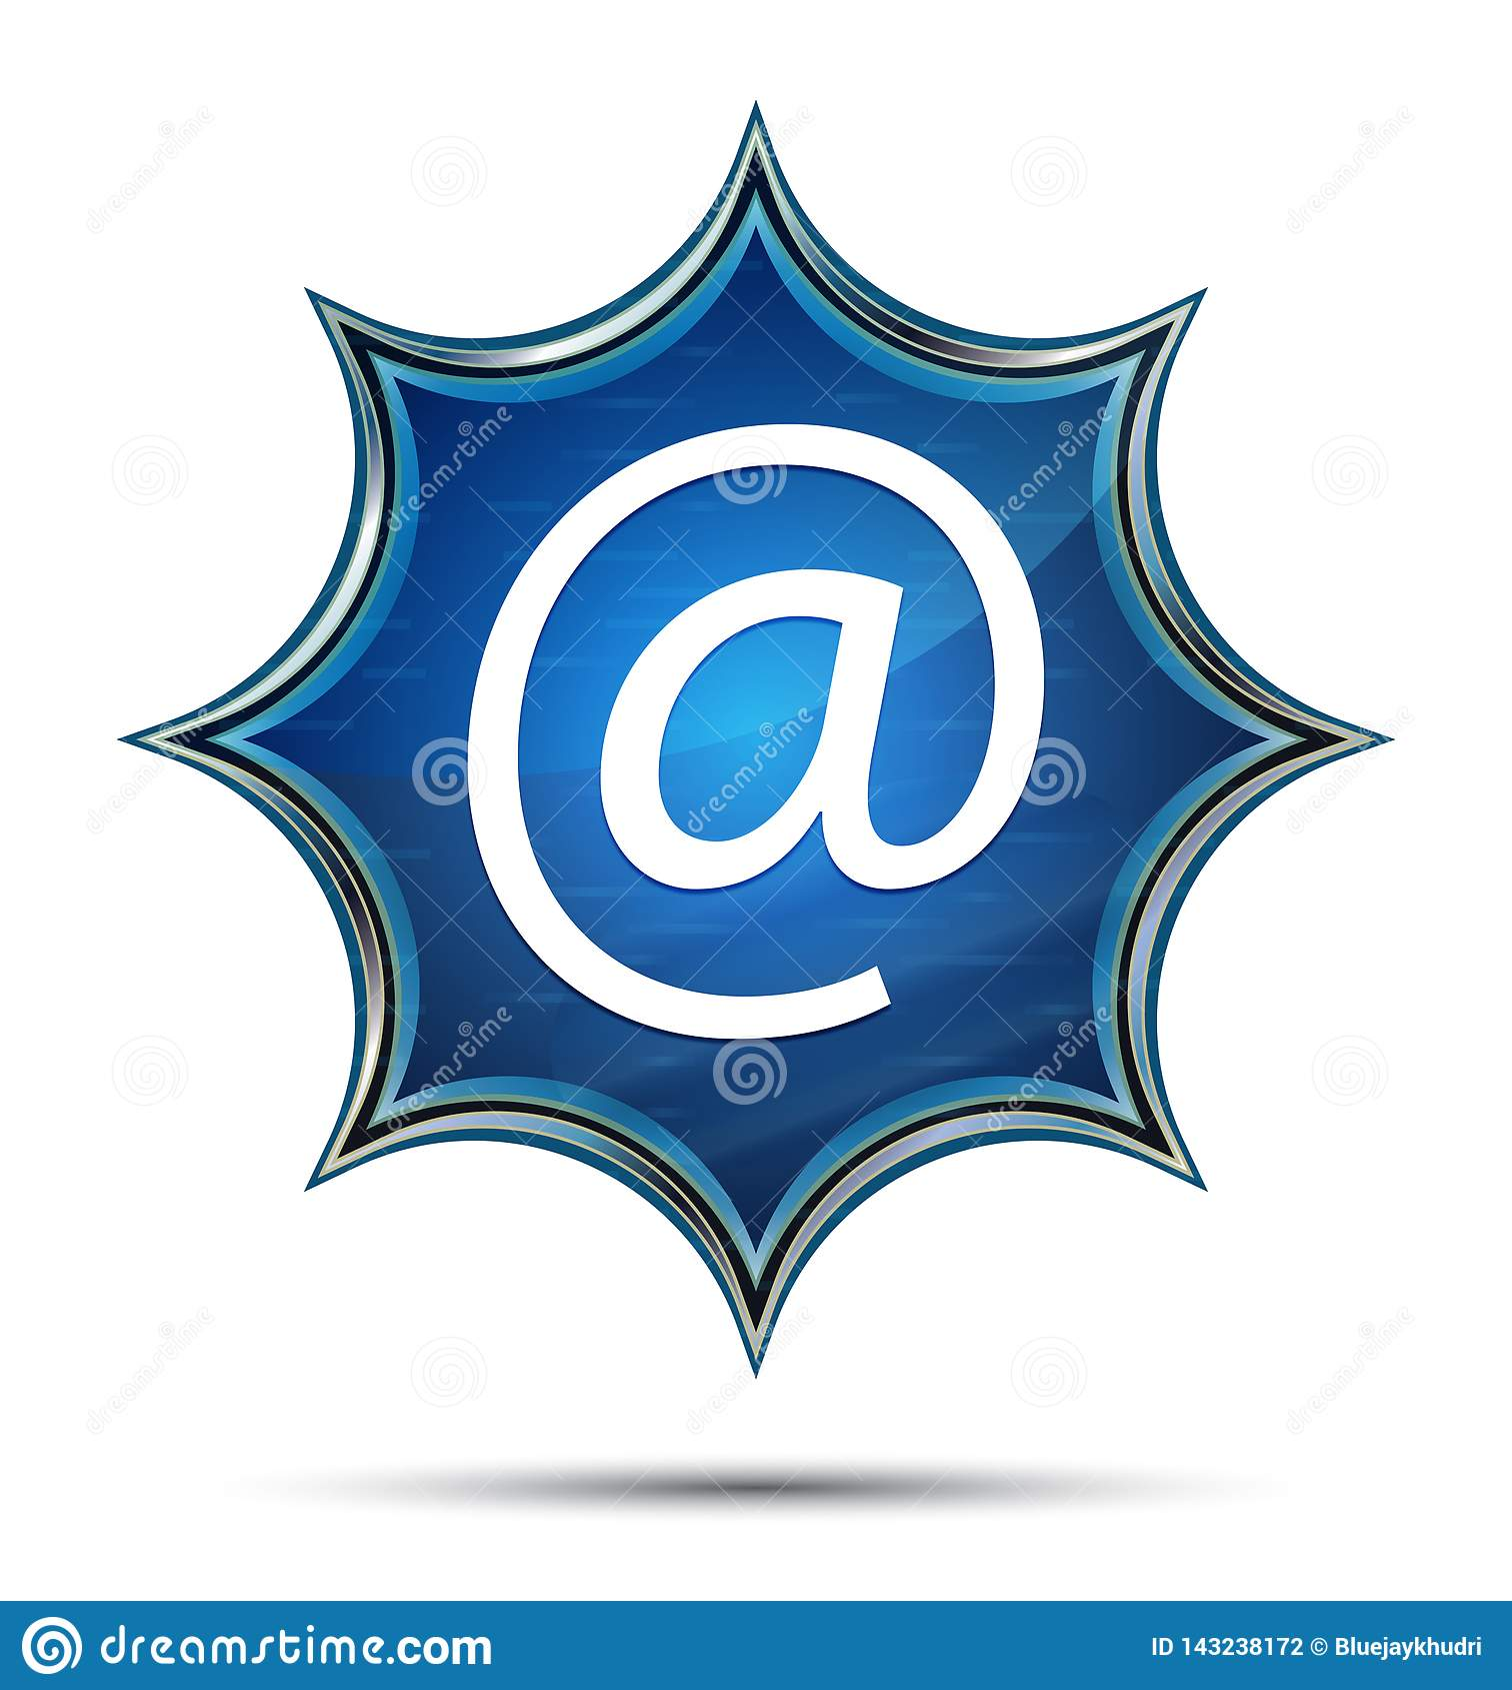 Botão azul sunburst vítreo mágico do ícone do endereço email